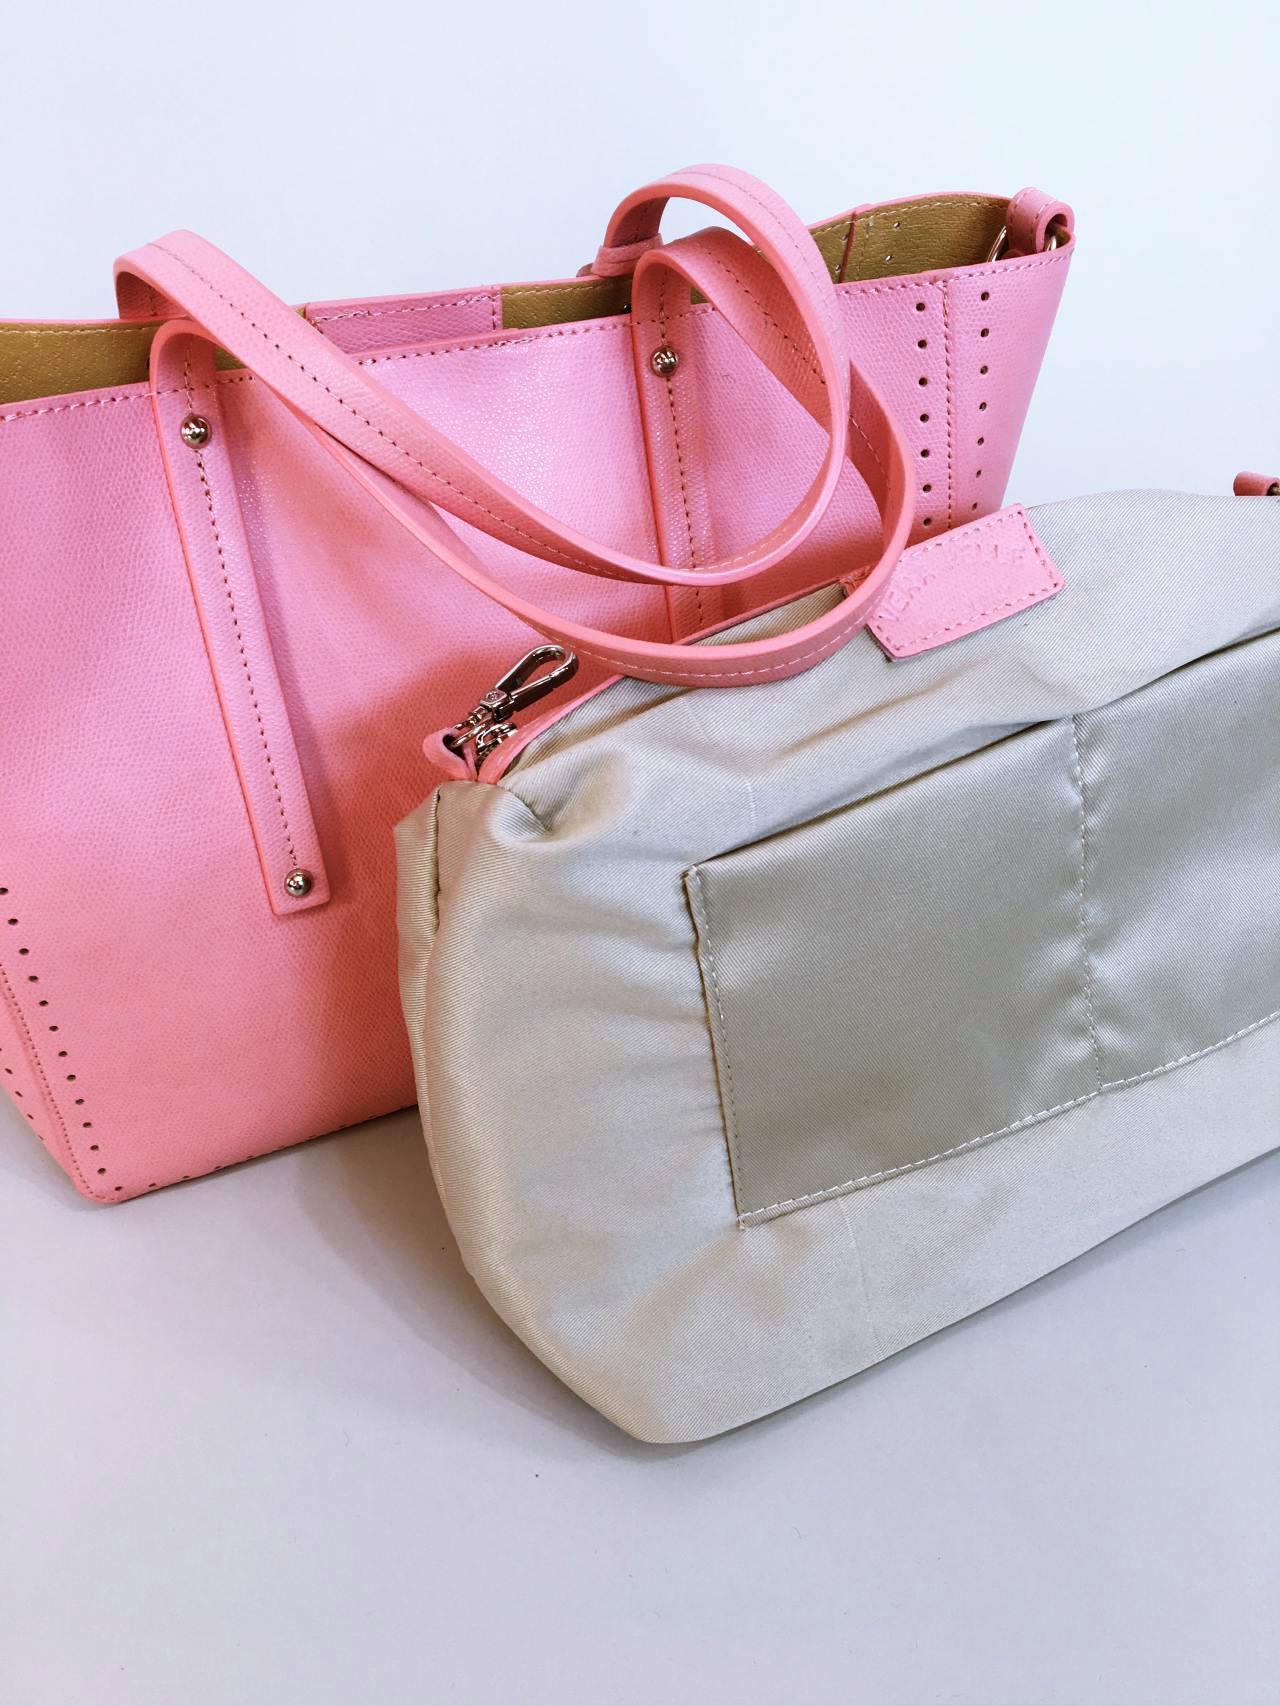 Kožená kabelka Bia růžová – Simm-Fashion.cz 5f58a215a1